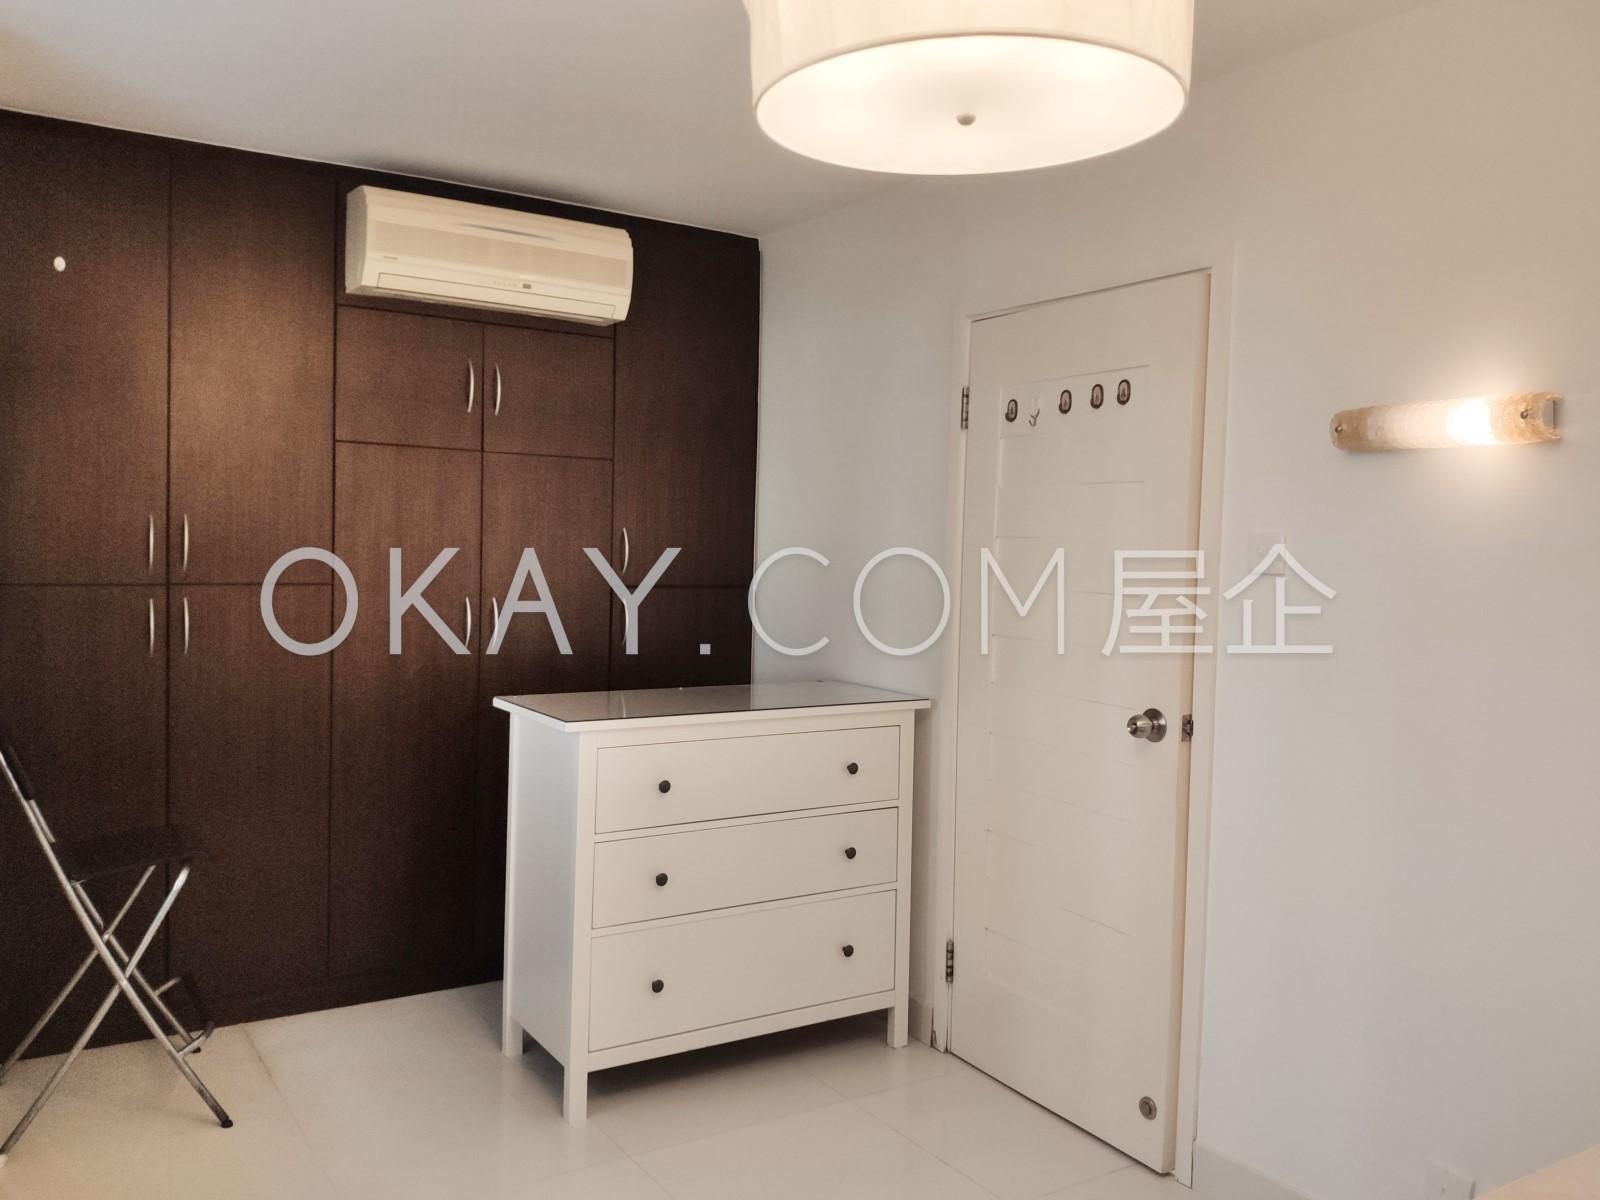 First Bedroom Built-in Closet